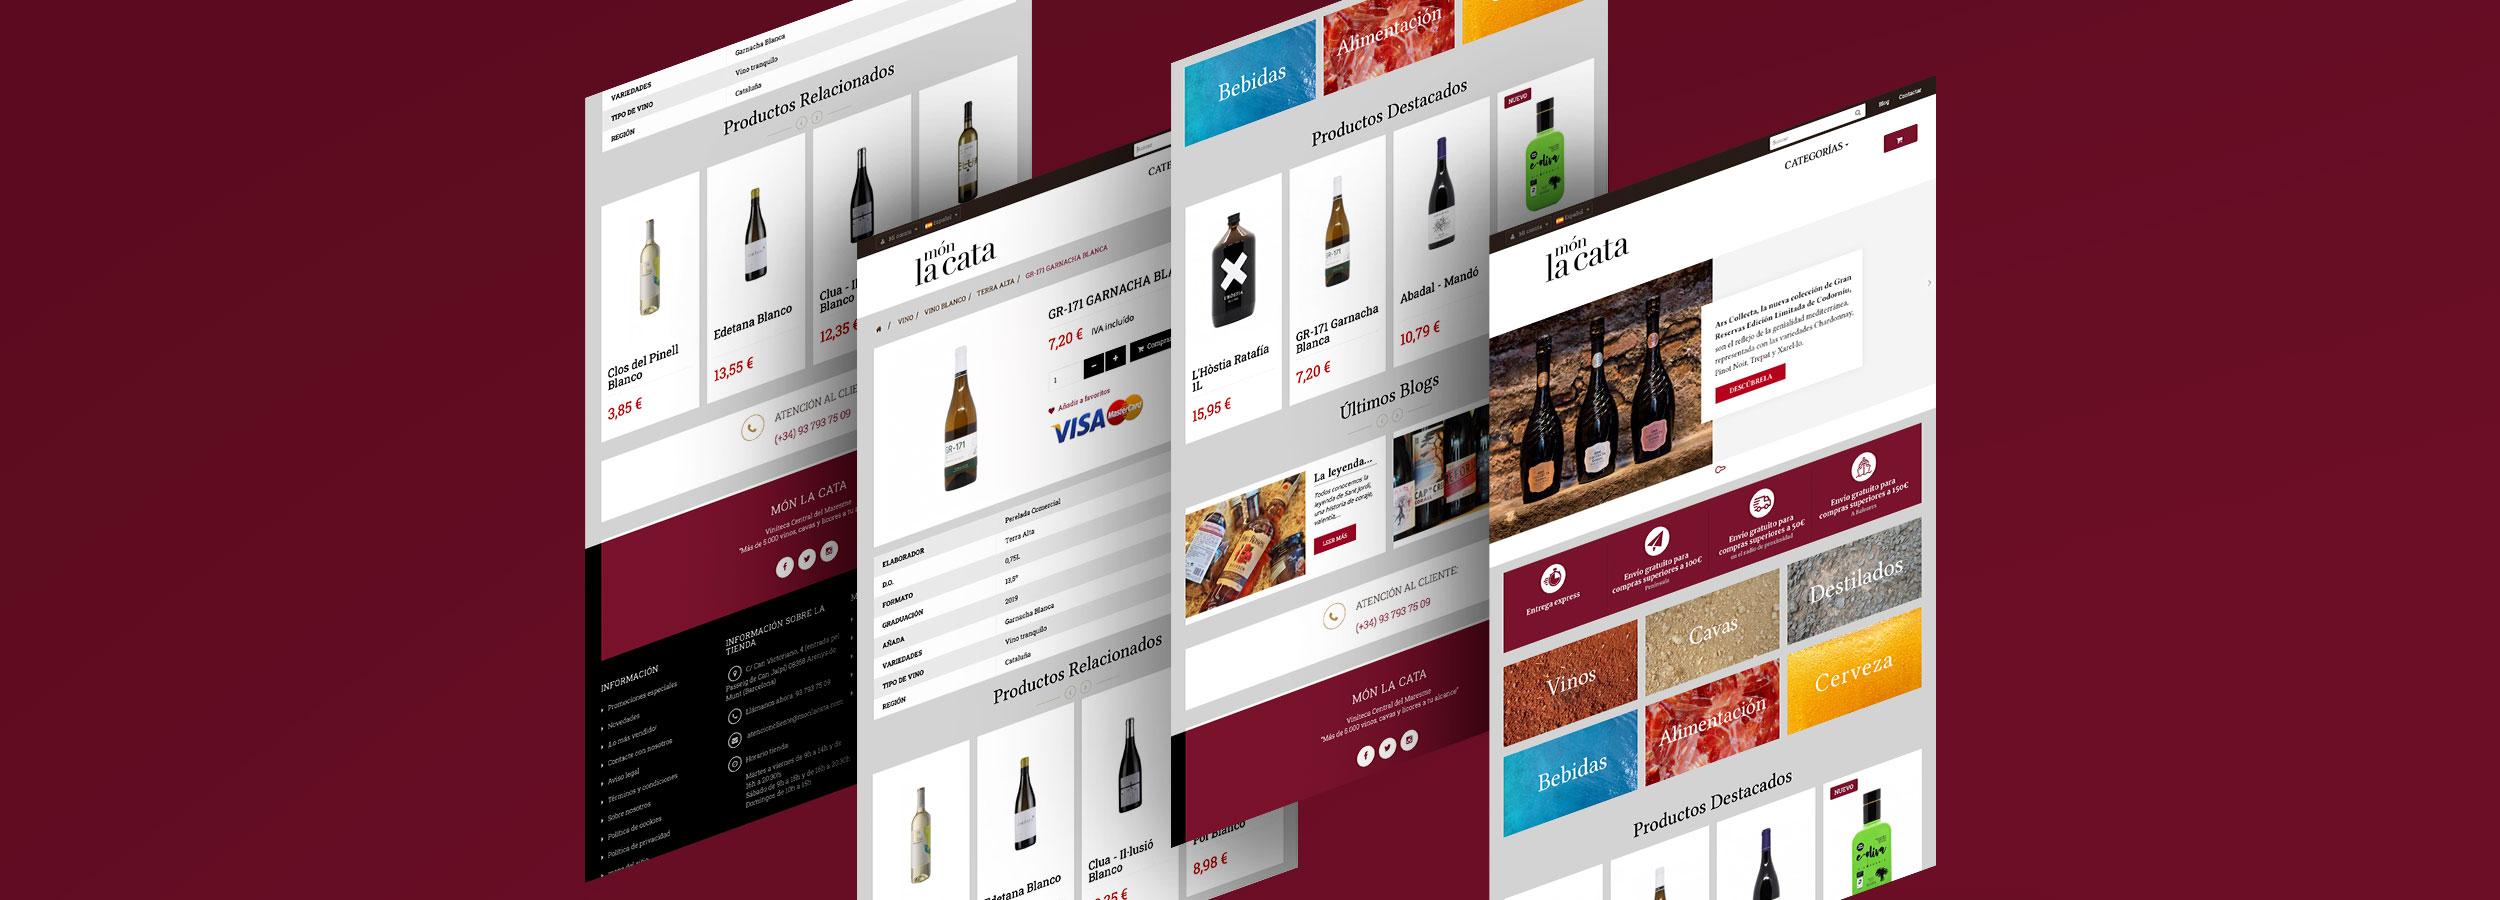 Proyecto marketing Digital Vinos